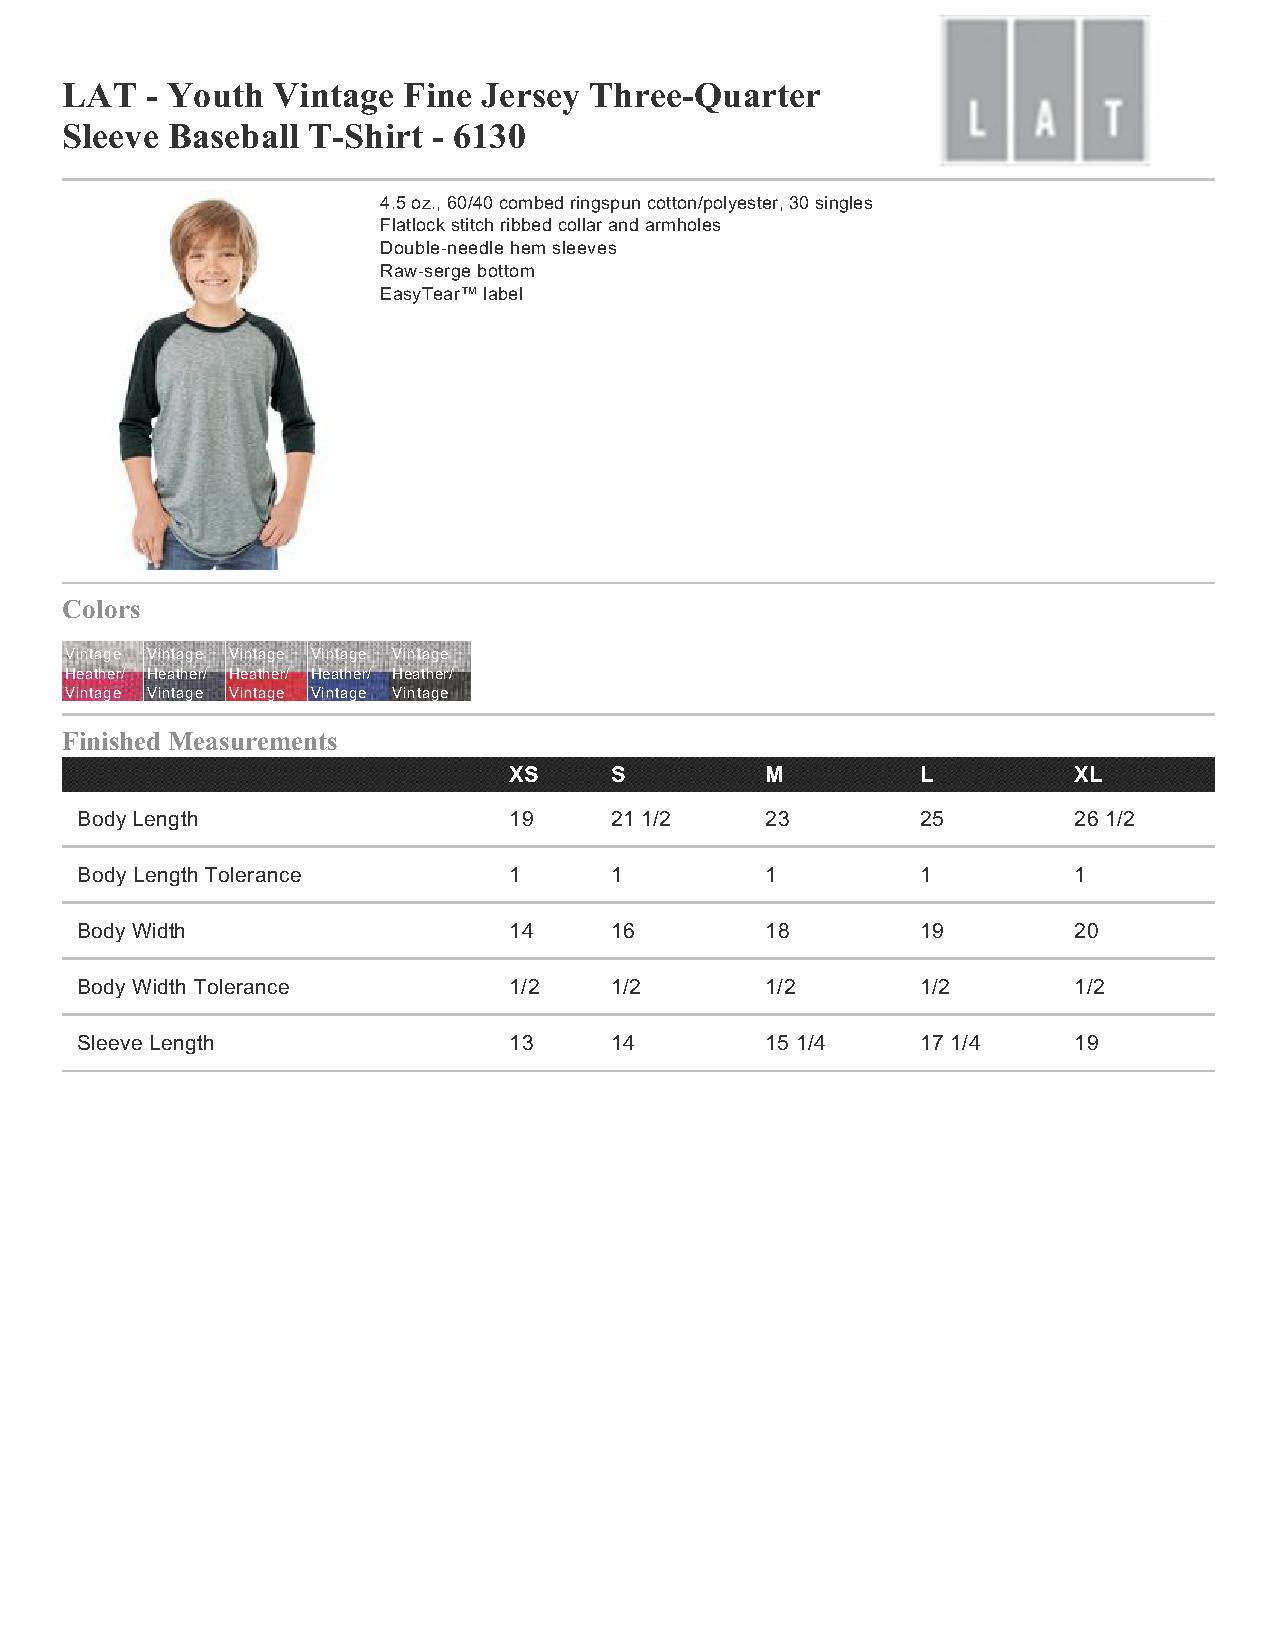 b0c86e783d28 LAT Youth Vintage Fine Jersey Three-Quarter Sleeve Baseball T-Shirt ...